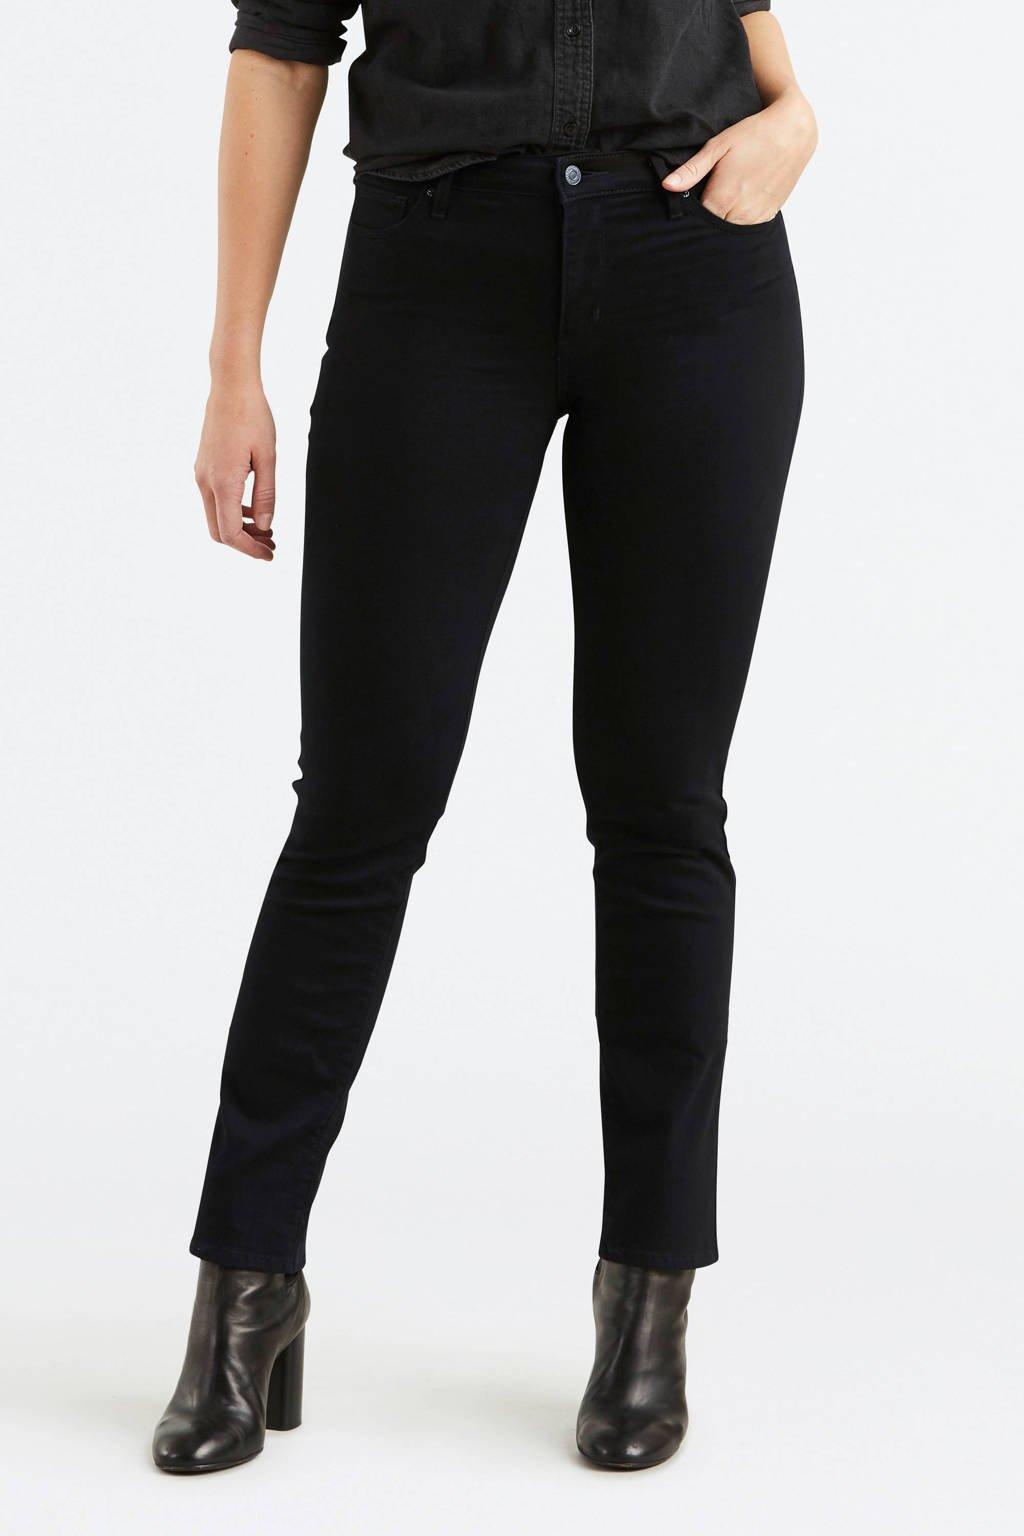 Levi's 712 slim fit jeans black sheep, Black Sheep